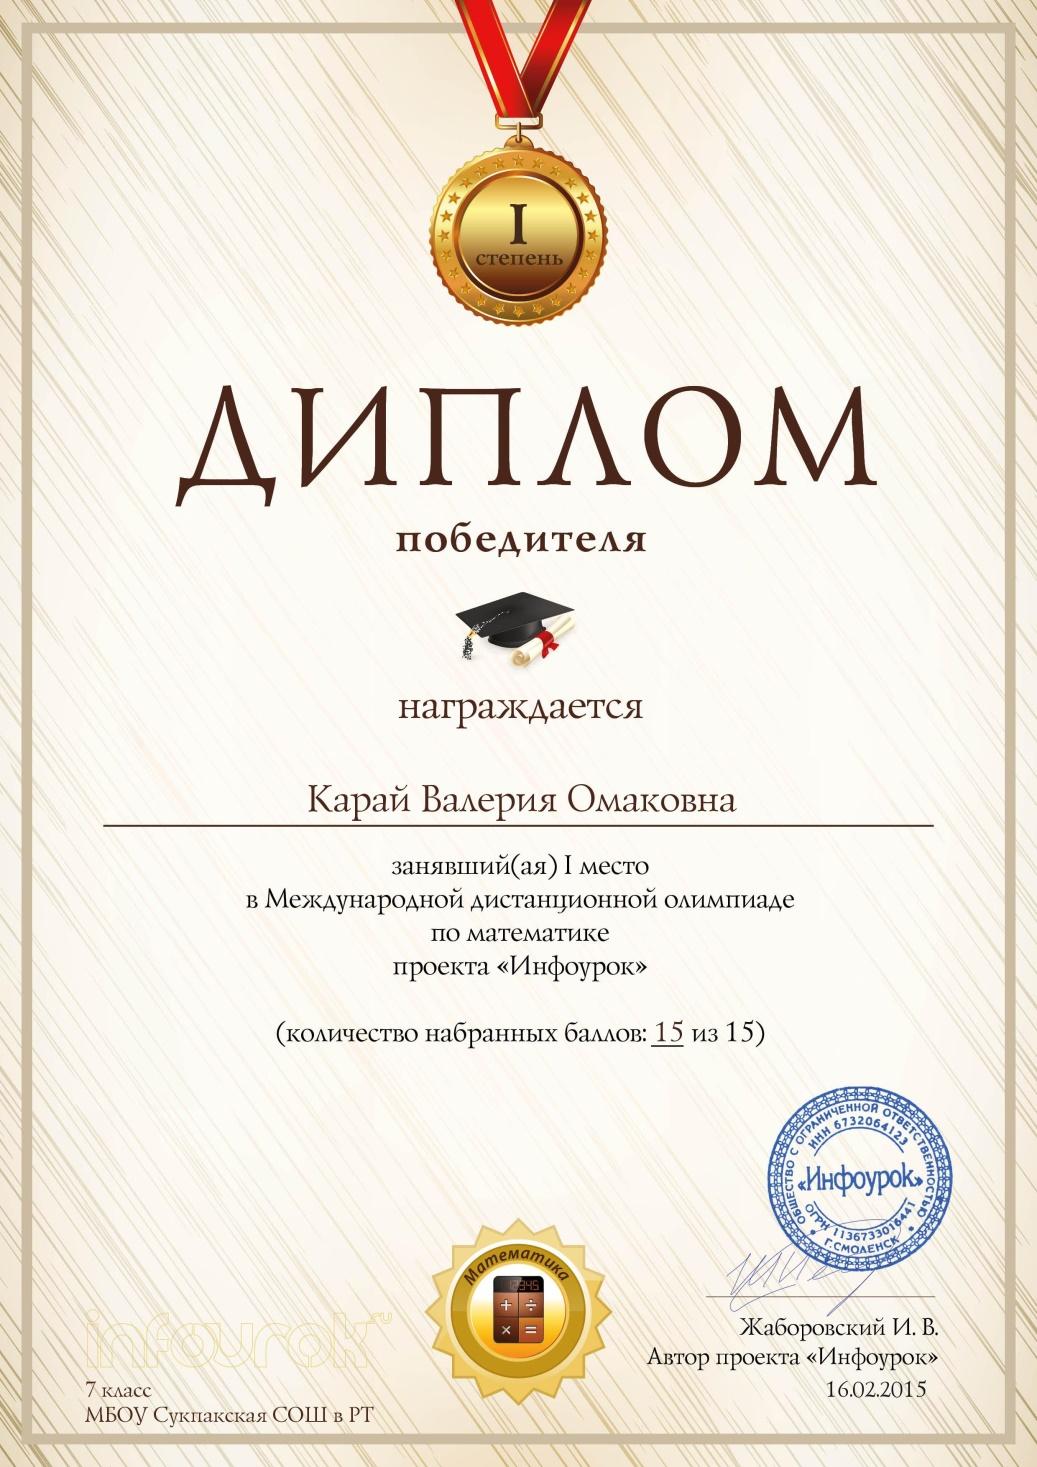 C:\Users\Снежана\Desktop\сертификаты инфоурок\олимпиада результат\format_A5_document_715120.jpg